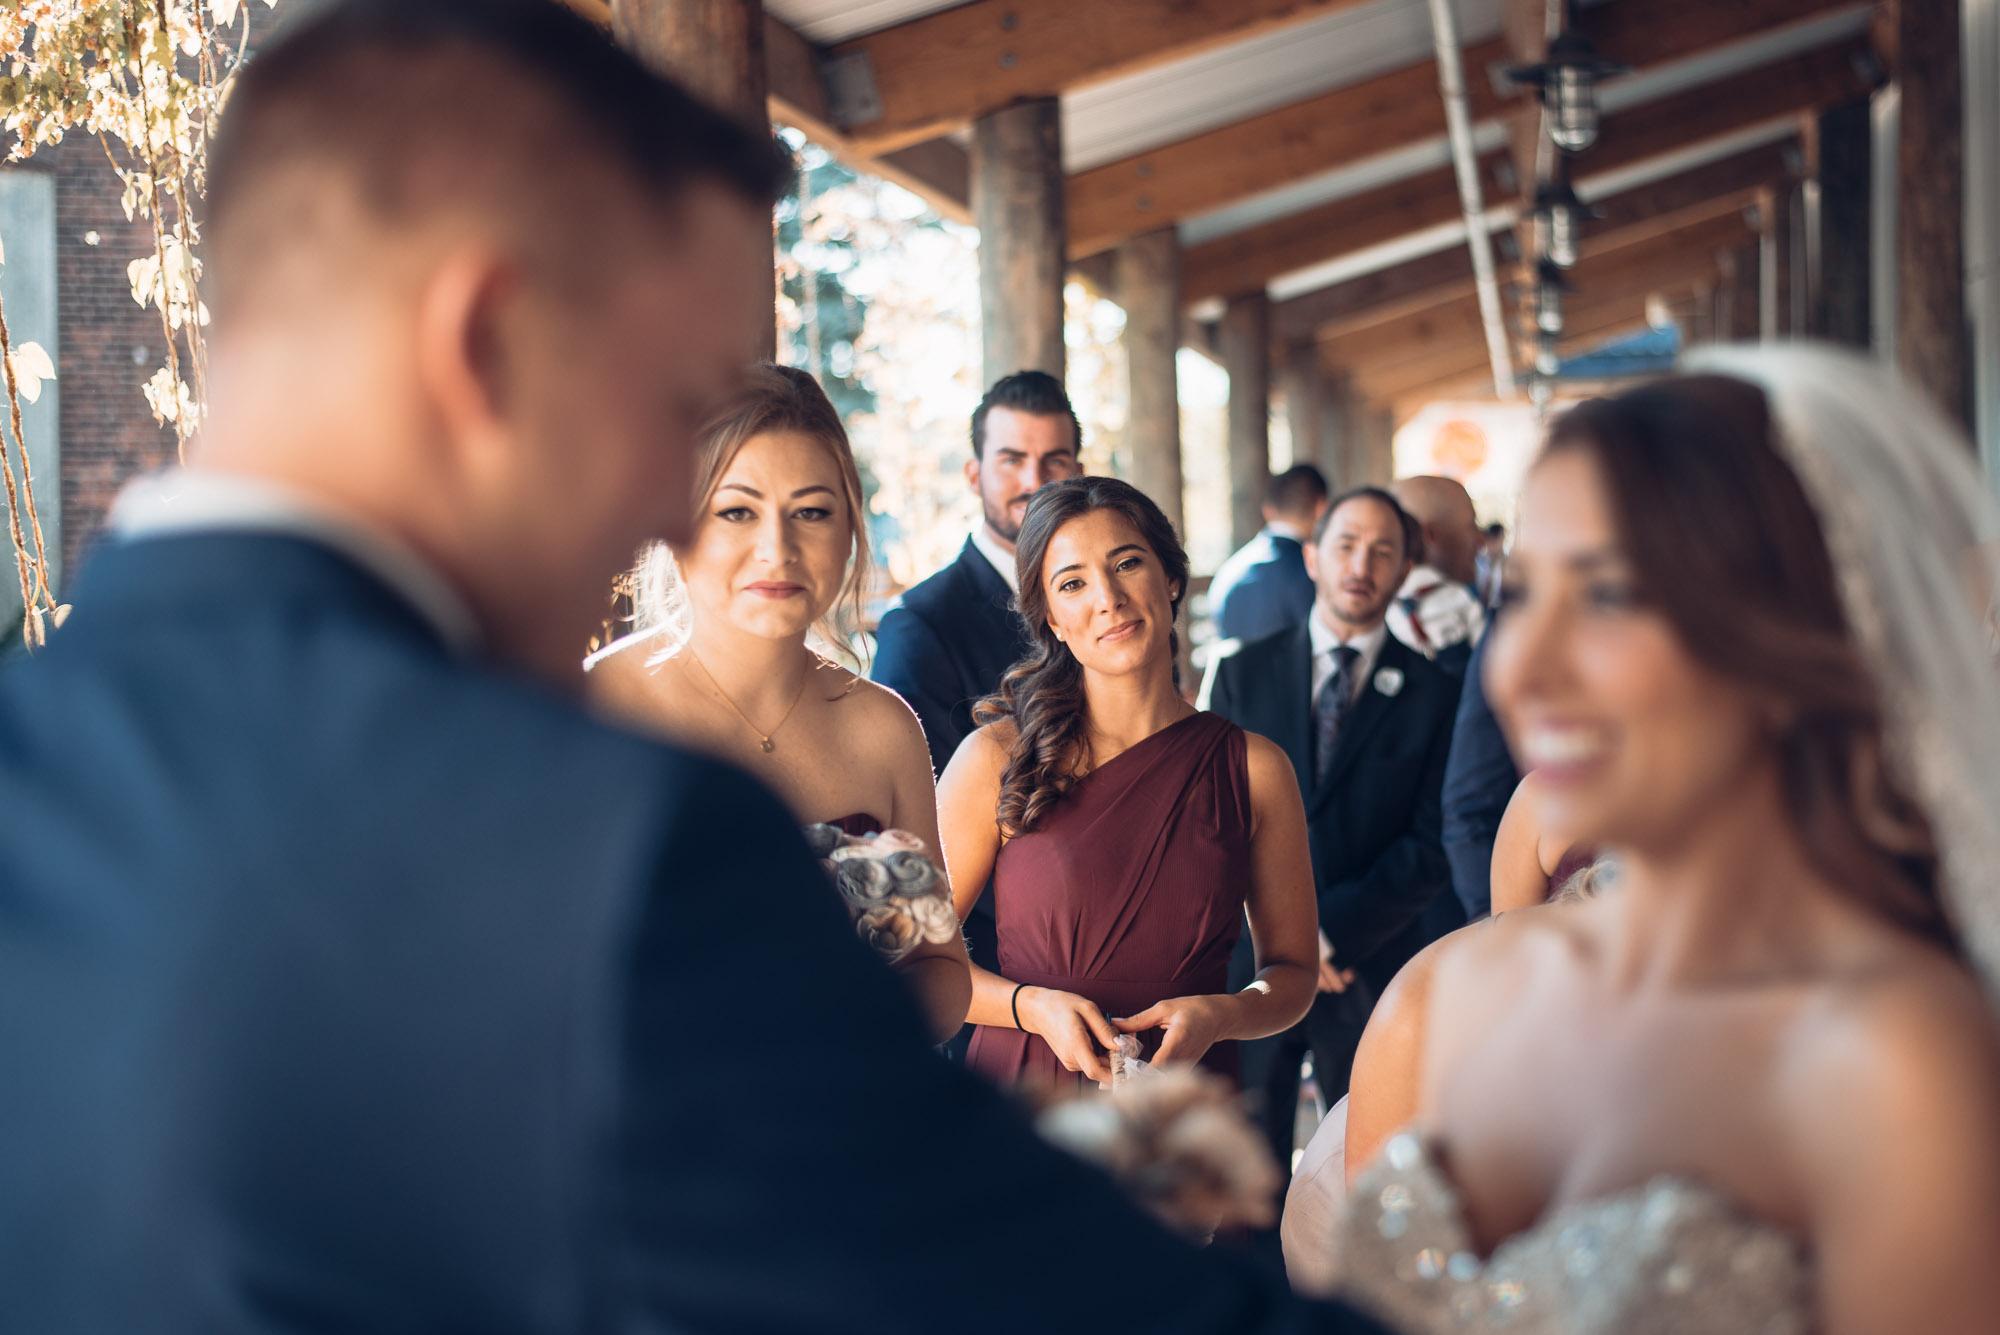 woodwinds_wedding_171020_web-25.jpg